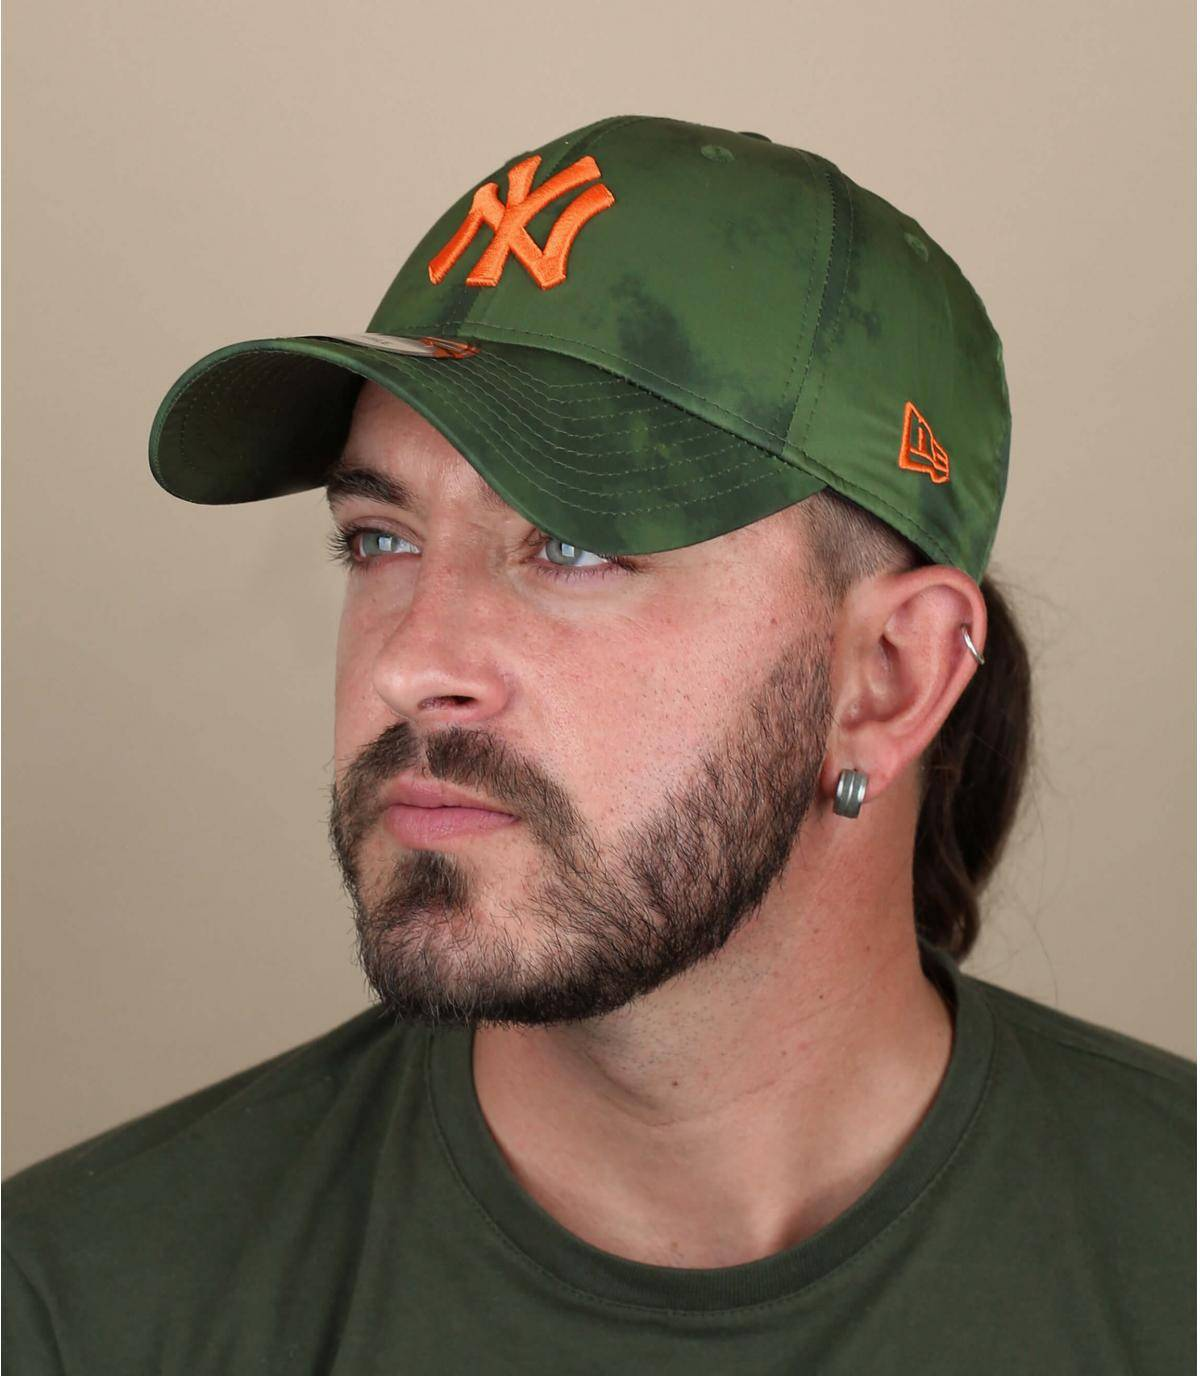 casquette NY vert